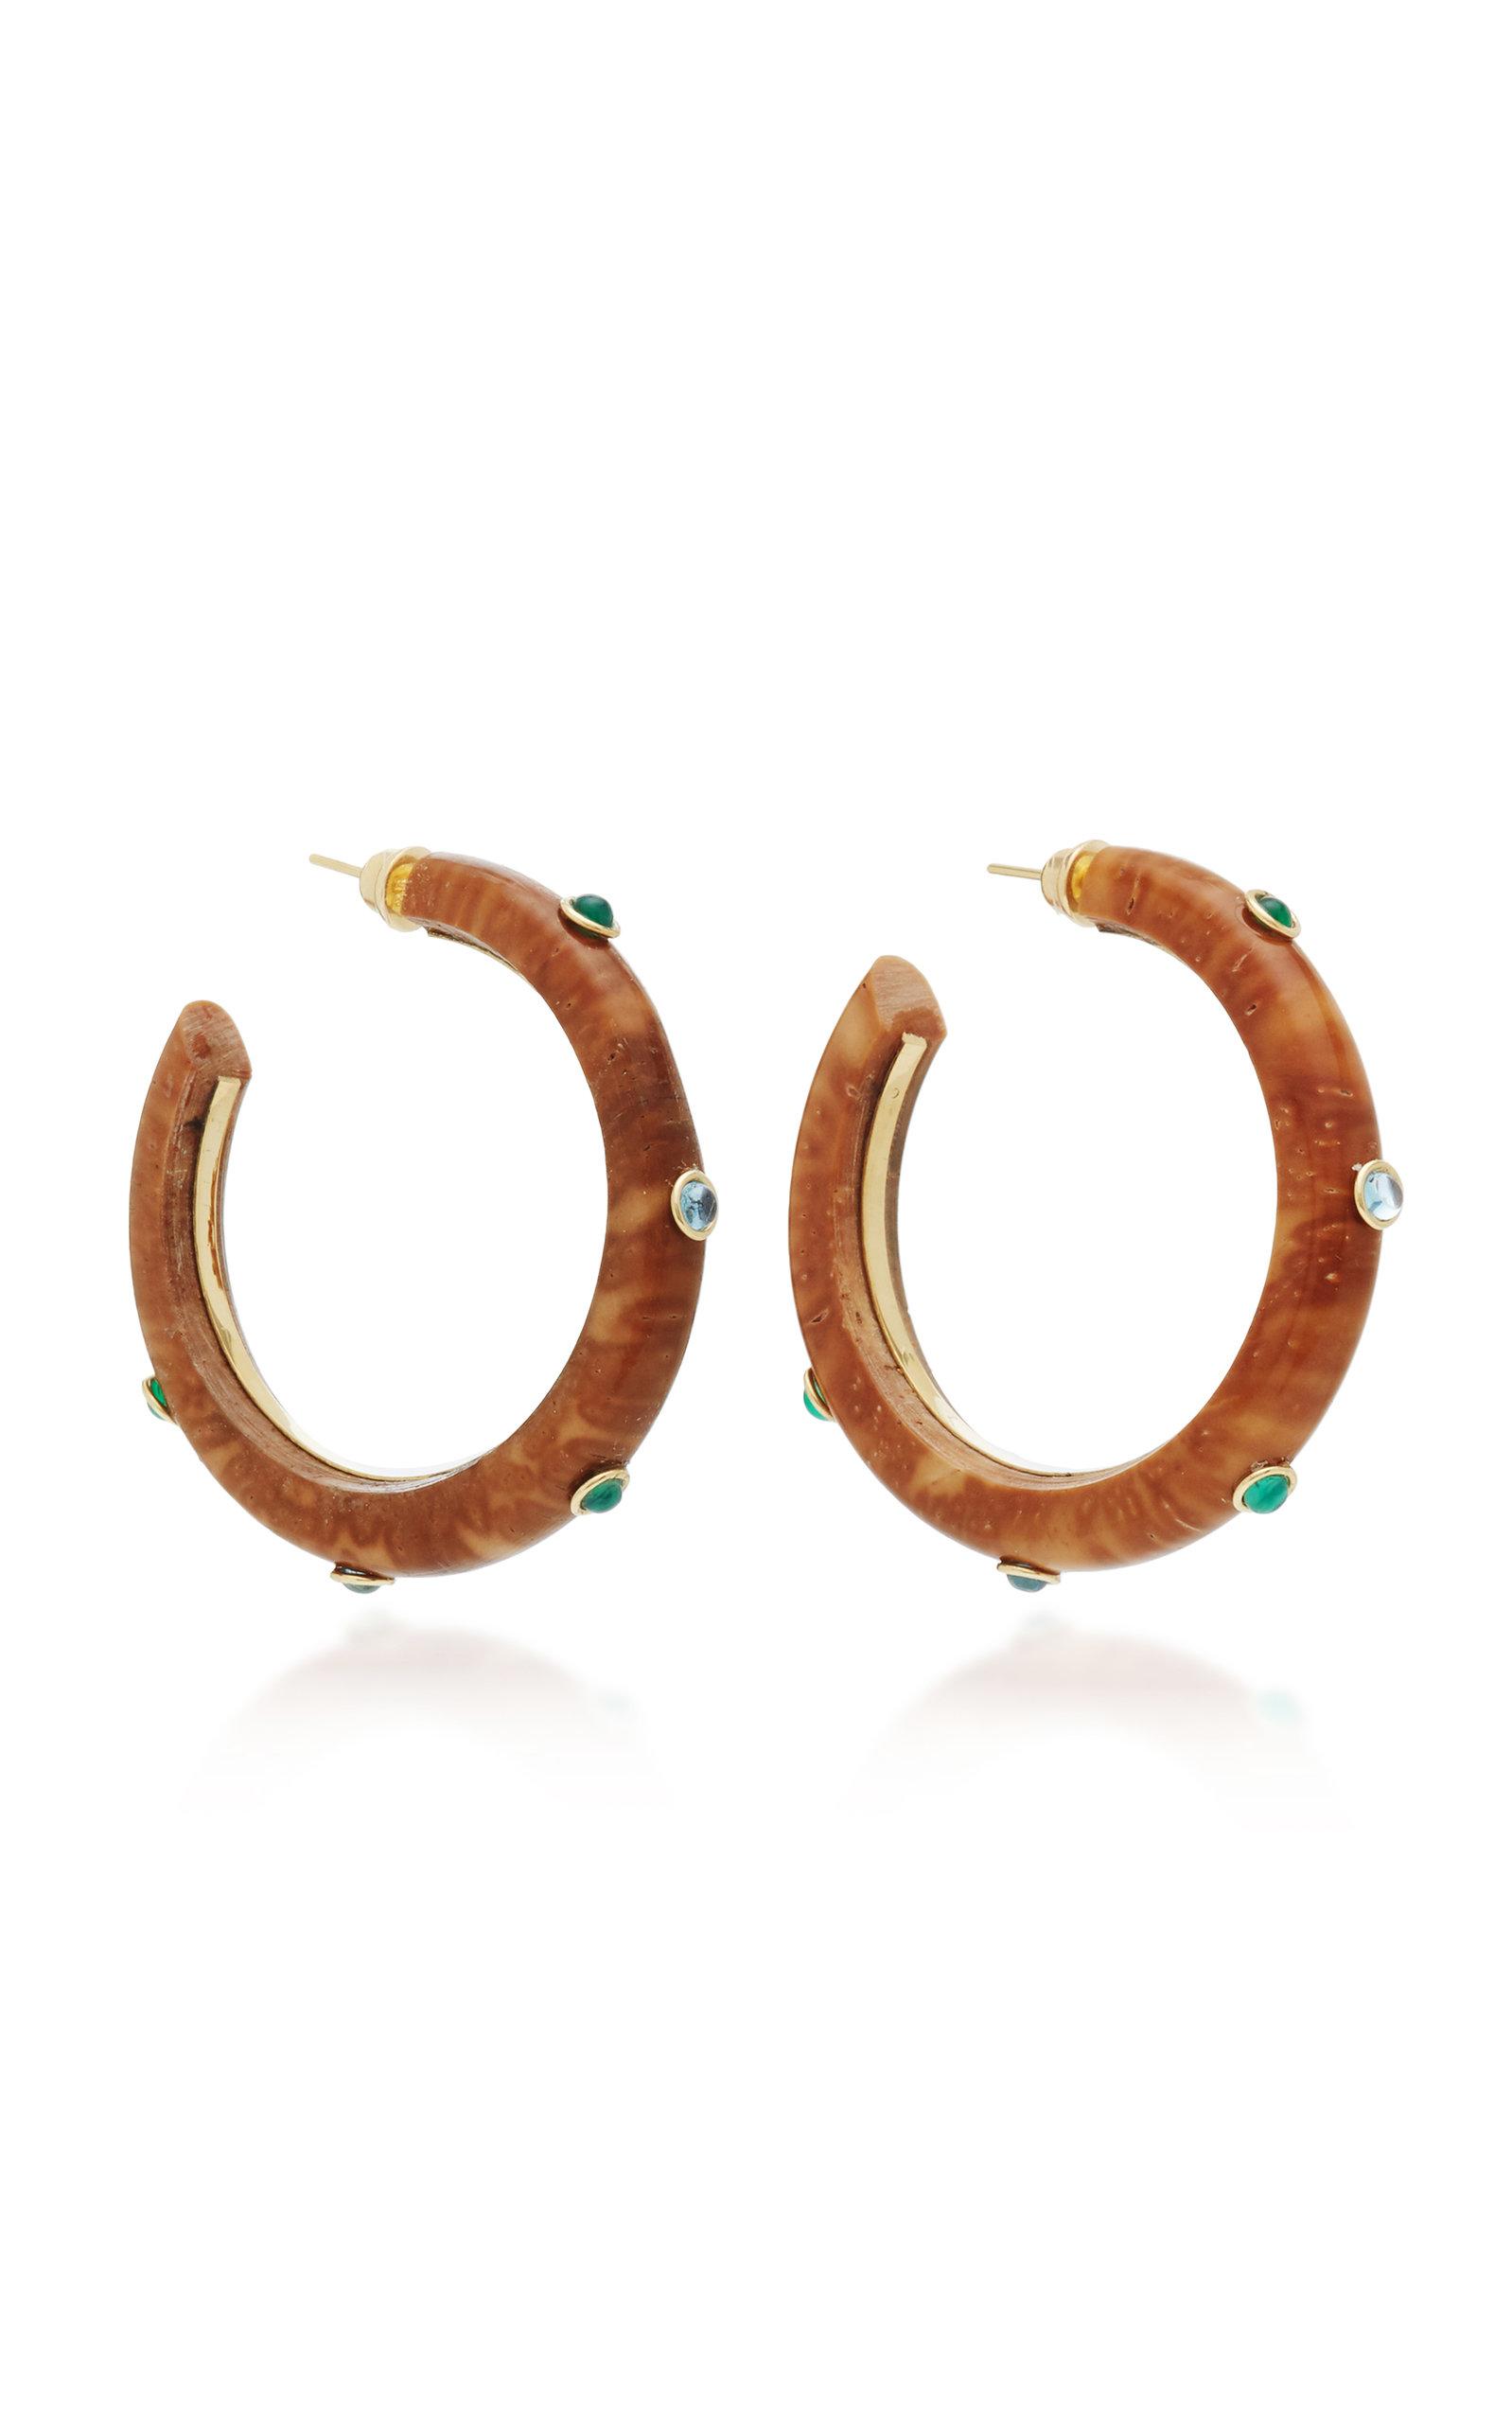 Eduarda Brunelli Accessories SAVANNAH 18K YELLOW GOLD SHELL TOPAZ AND CRISOPAZIO EARRINGS